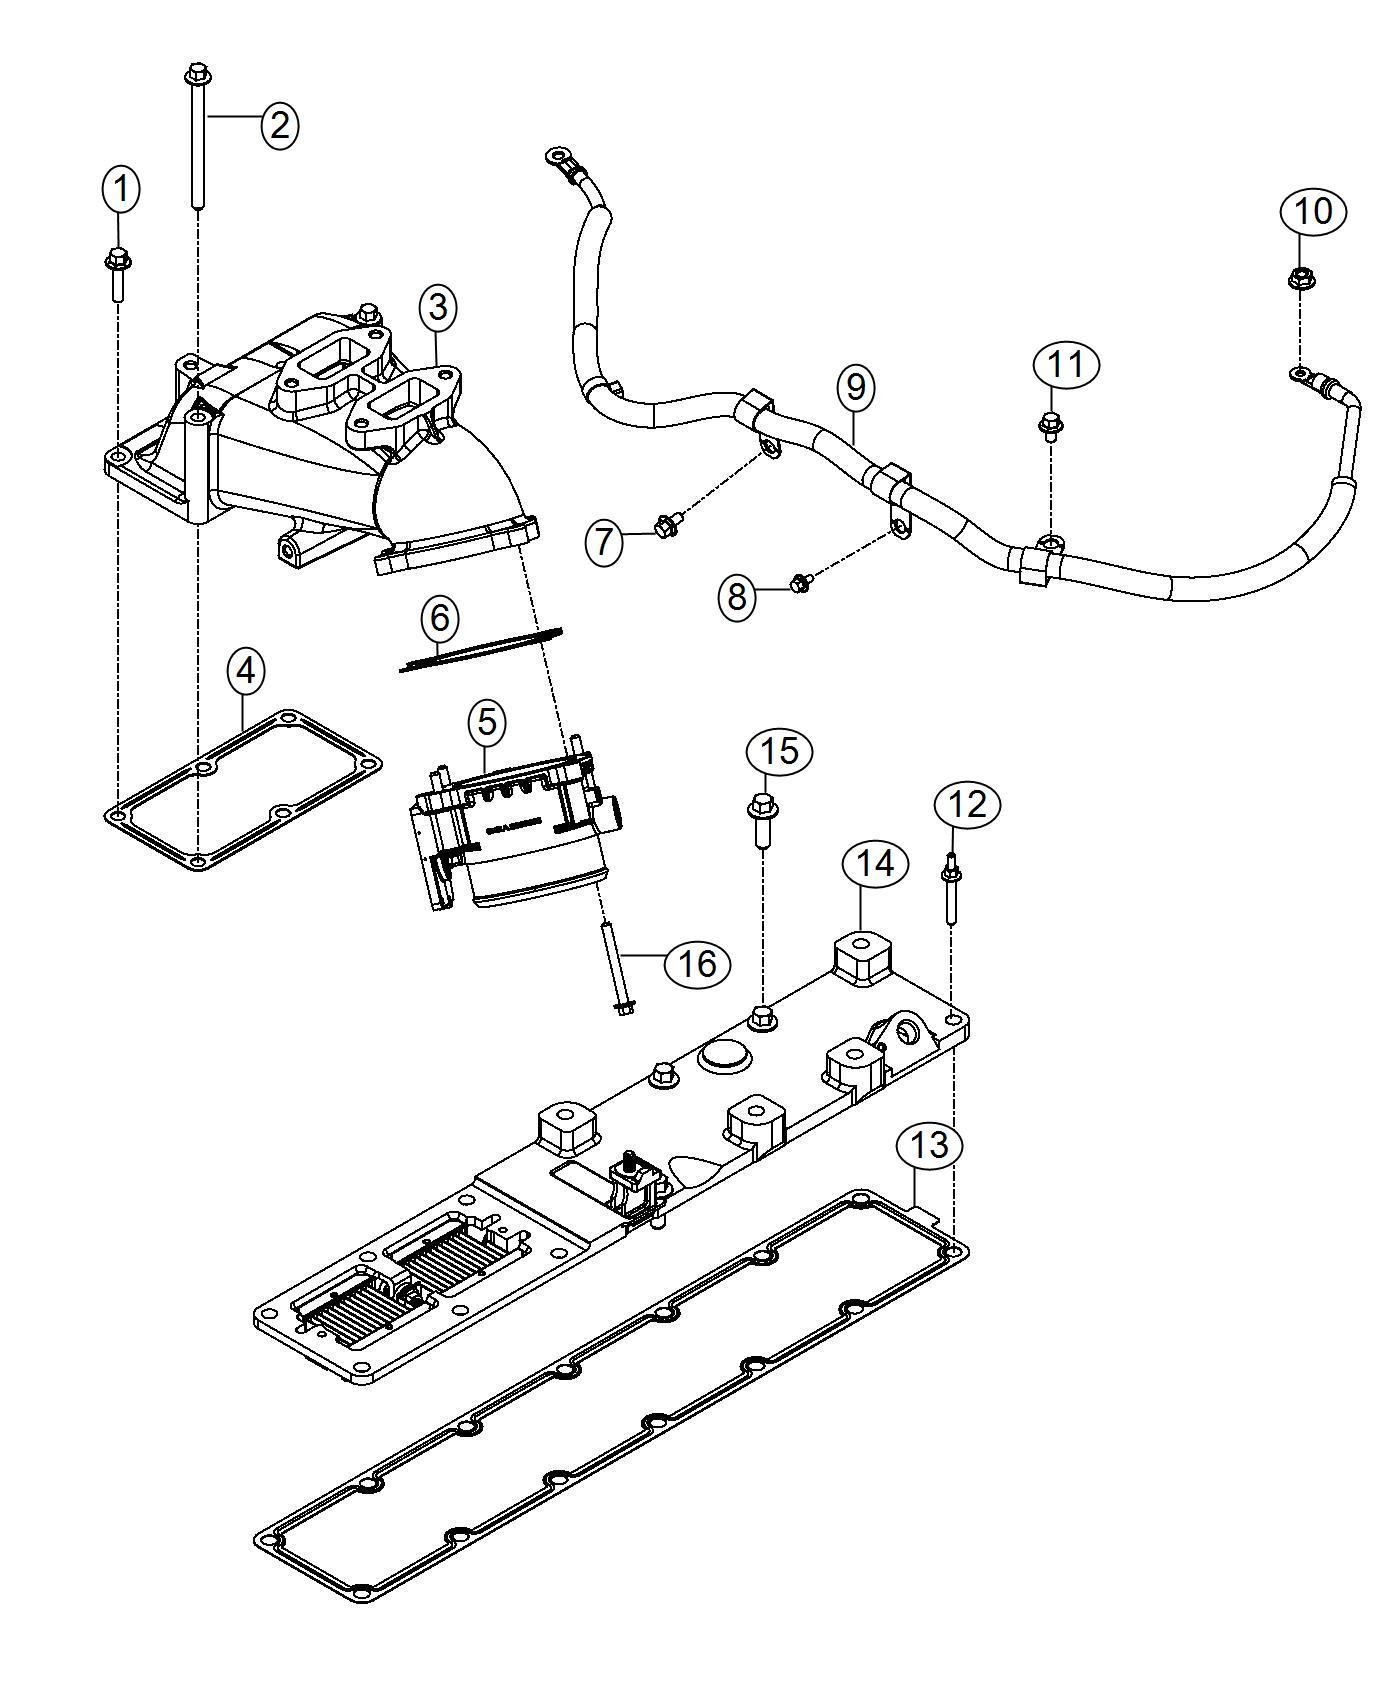 2013 Dodge Ram 4500 Wiring  Air Intake Heater  Engine